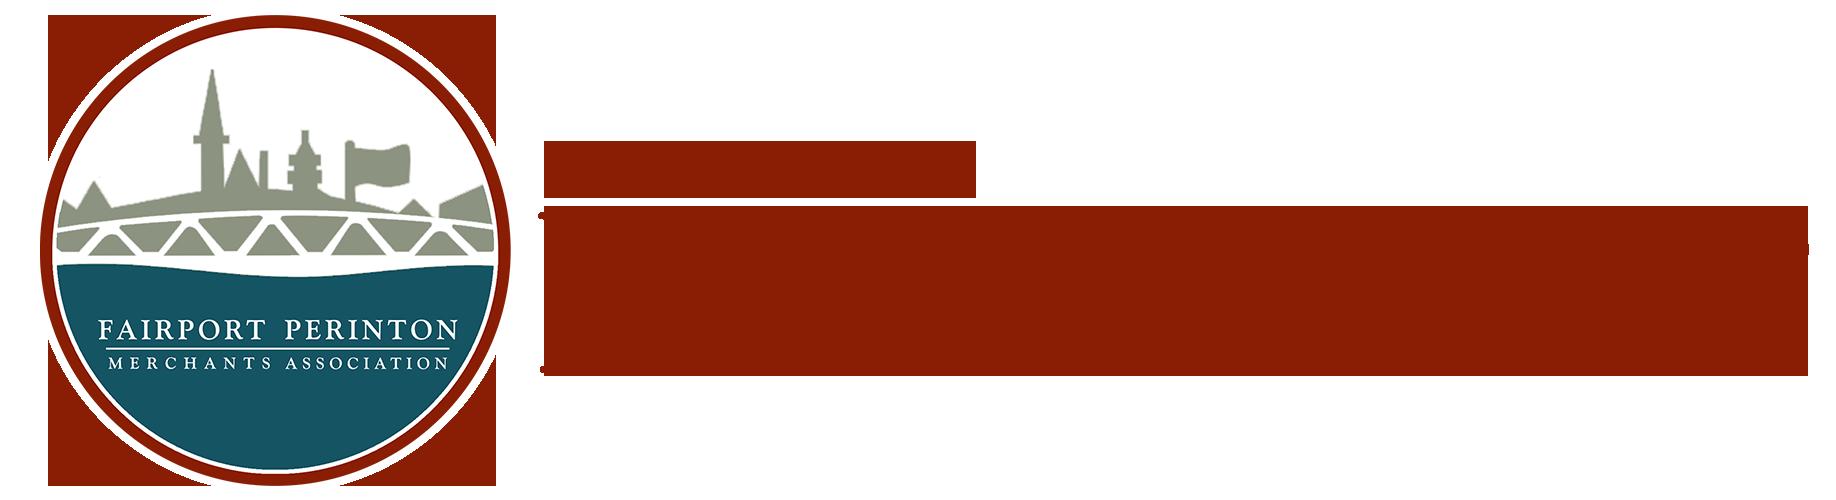 Find It In Fairport